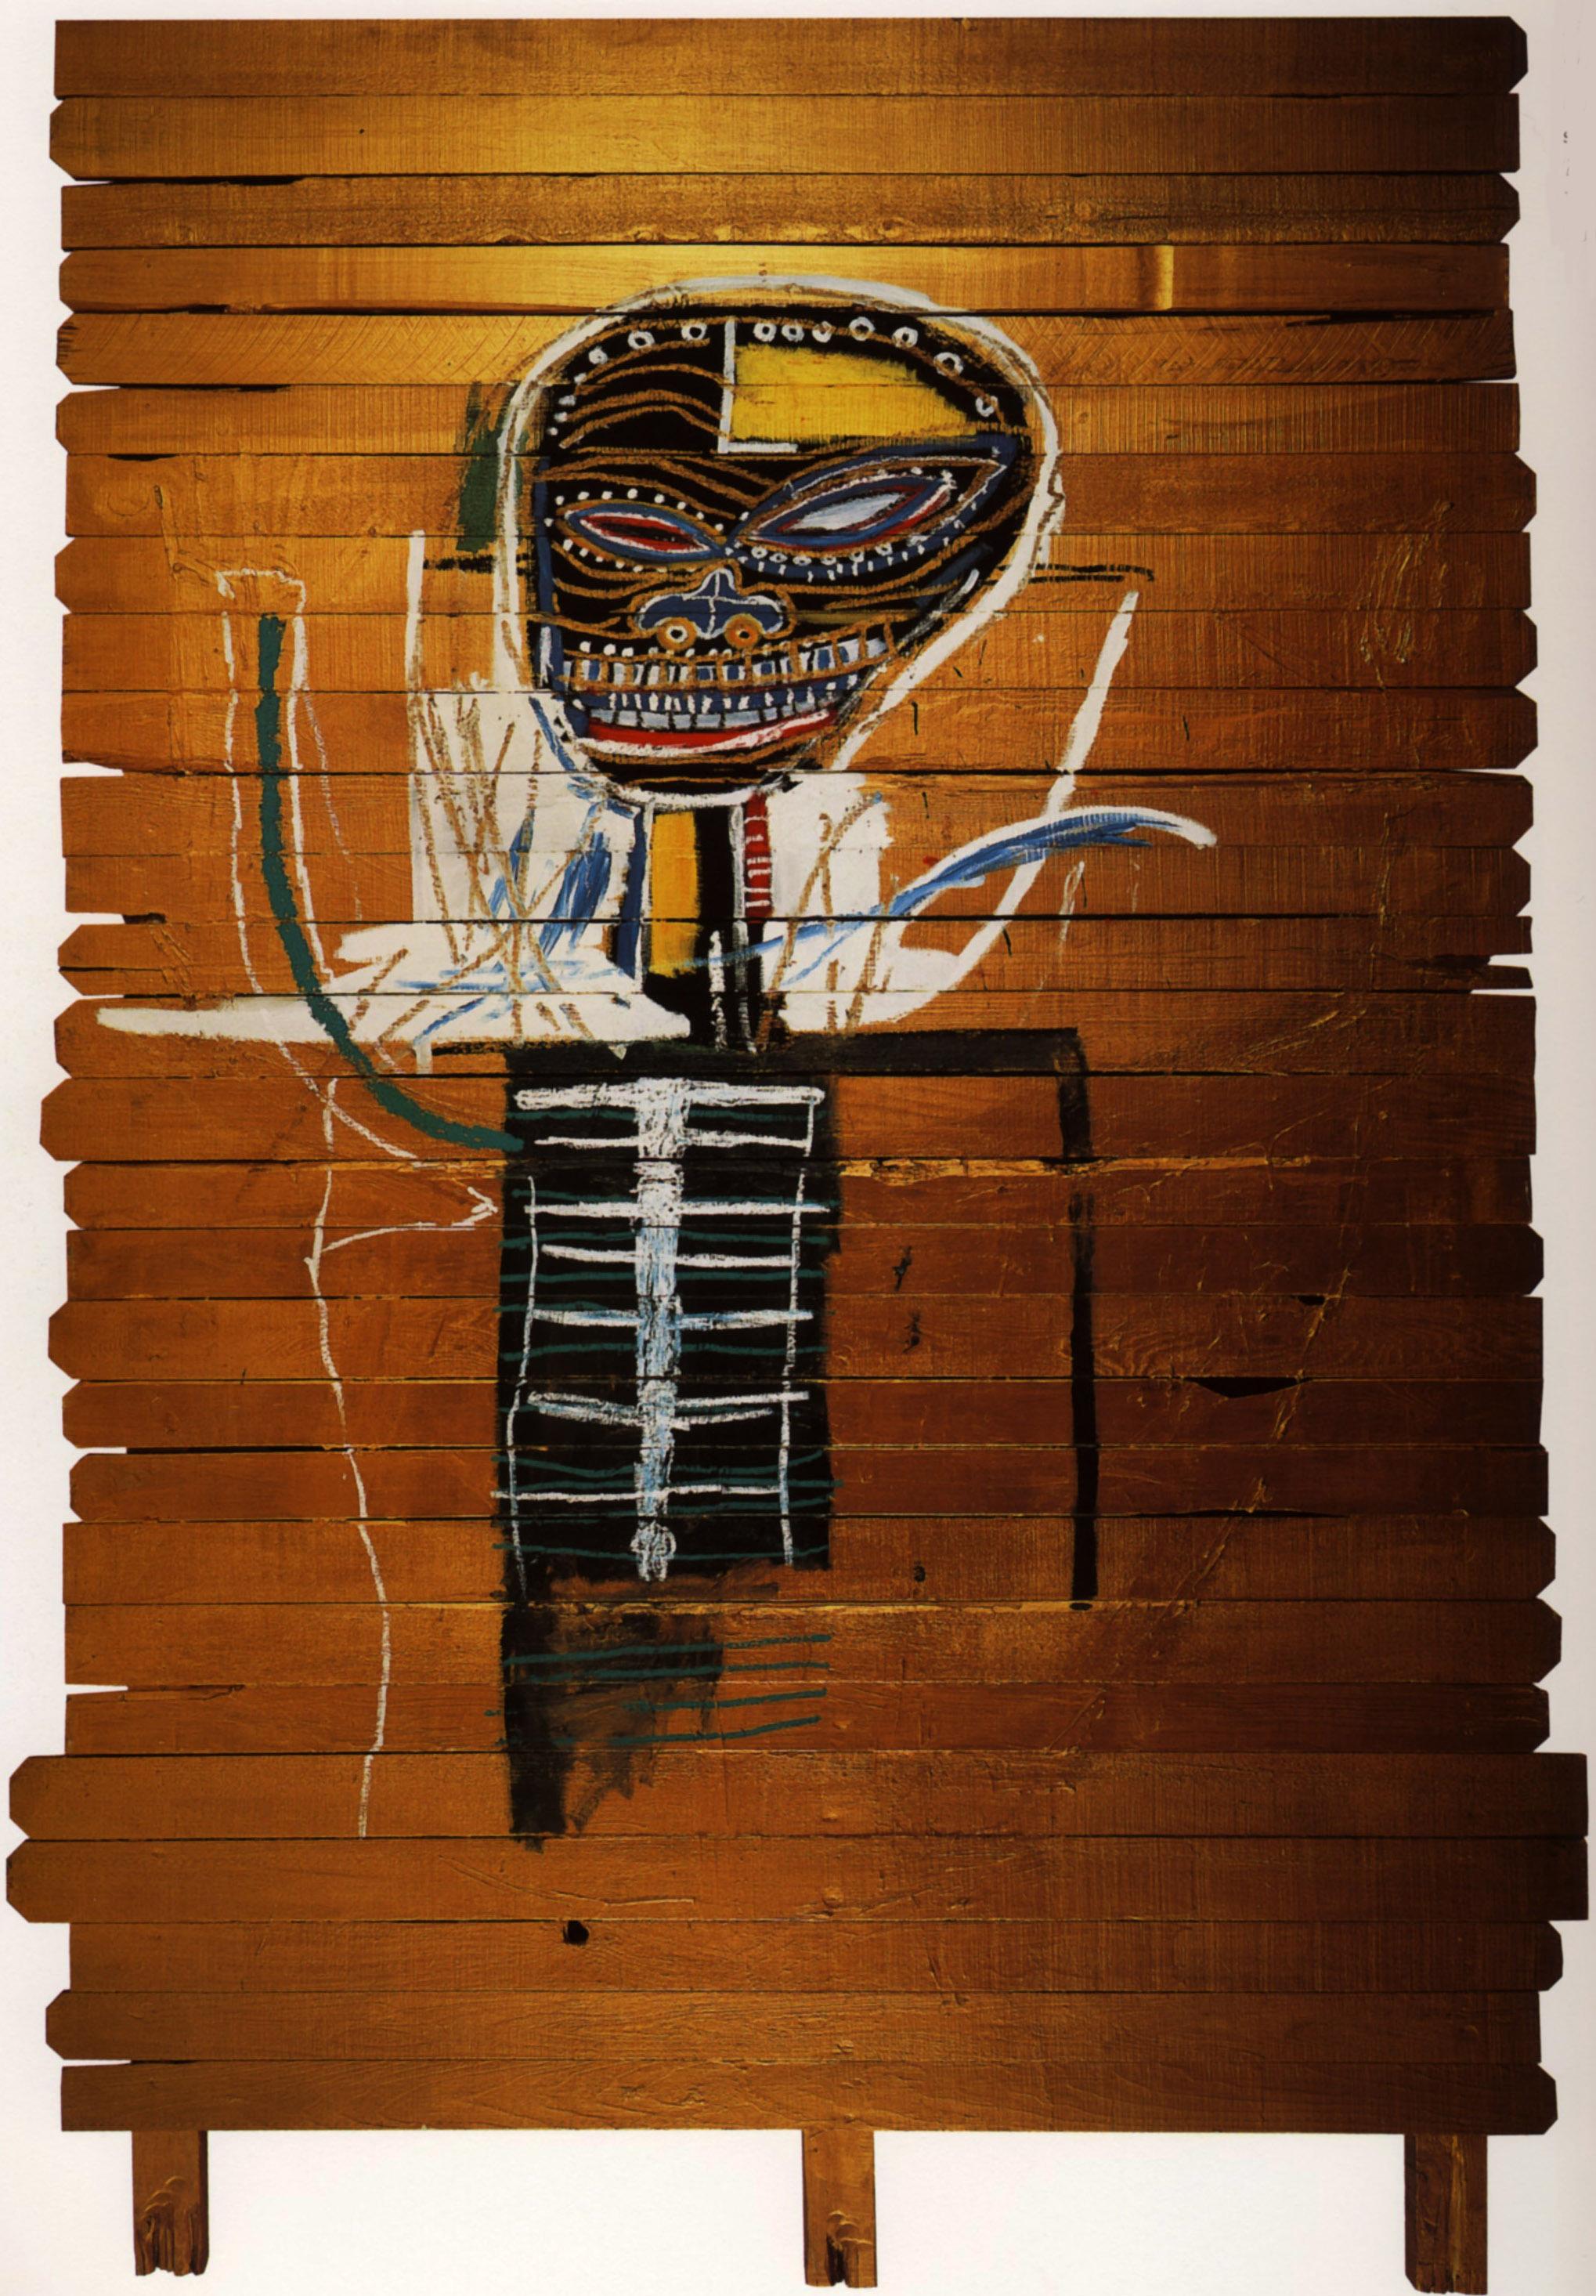 Jean-Michel Basquiat, Gold Griot, 1984 Image via Sotheby's